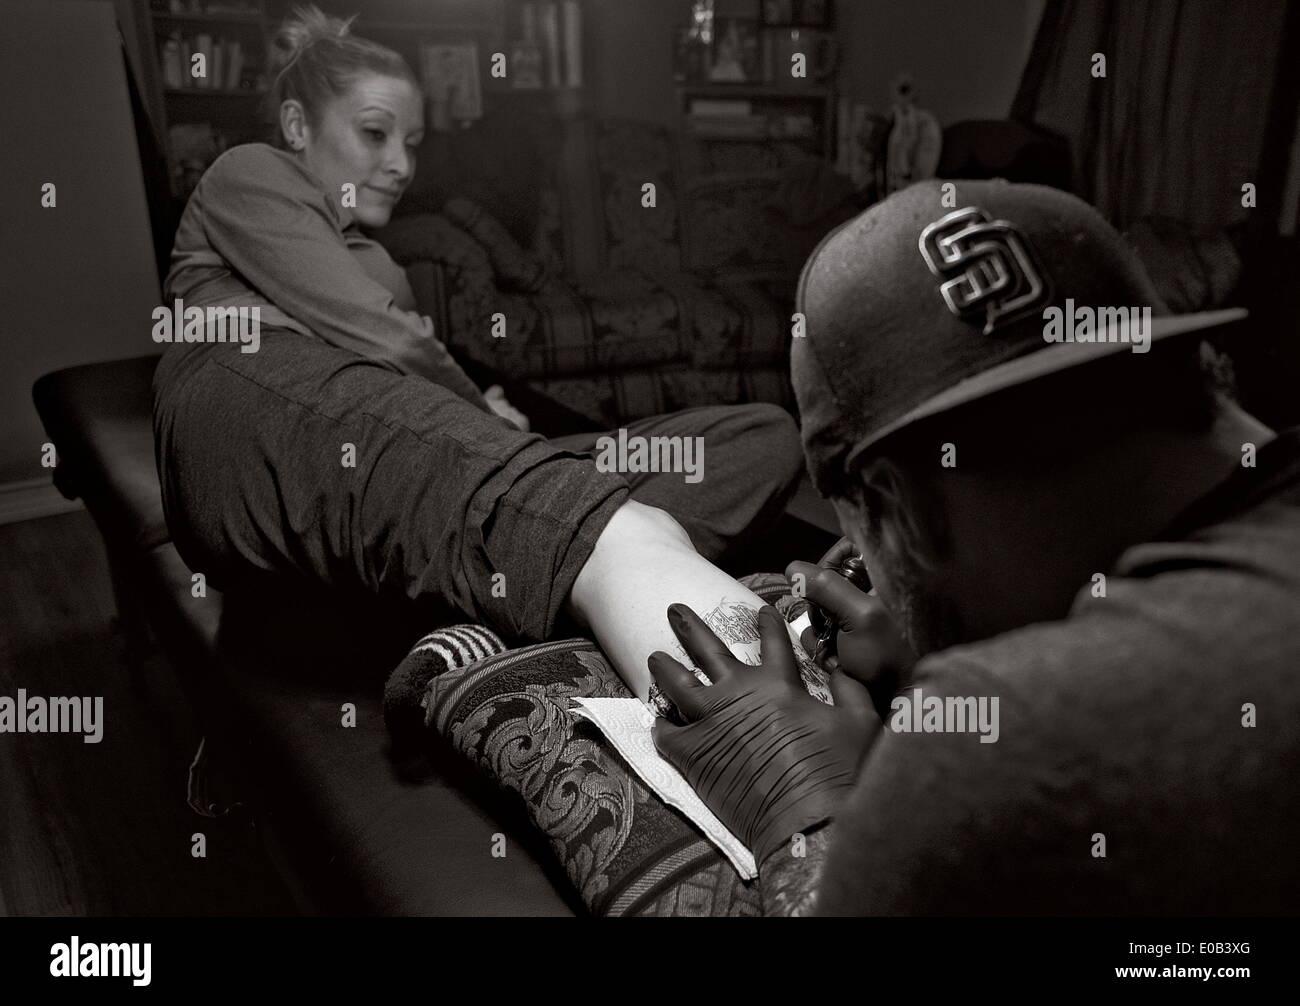 Jan 30 2014 columbus mississippi u s paulie for Tattoo removal columbus ohio cost